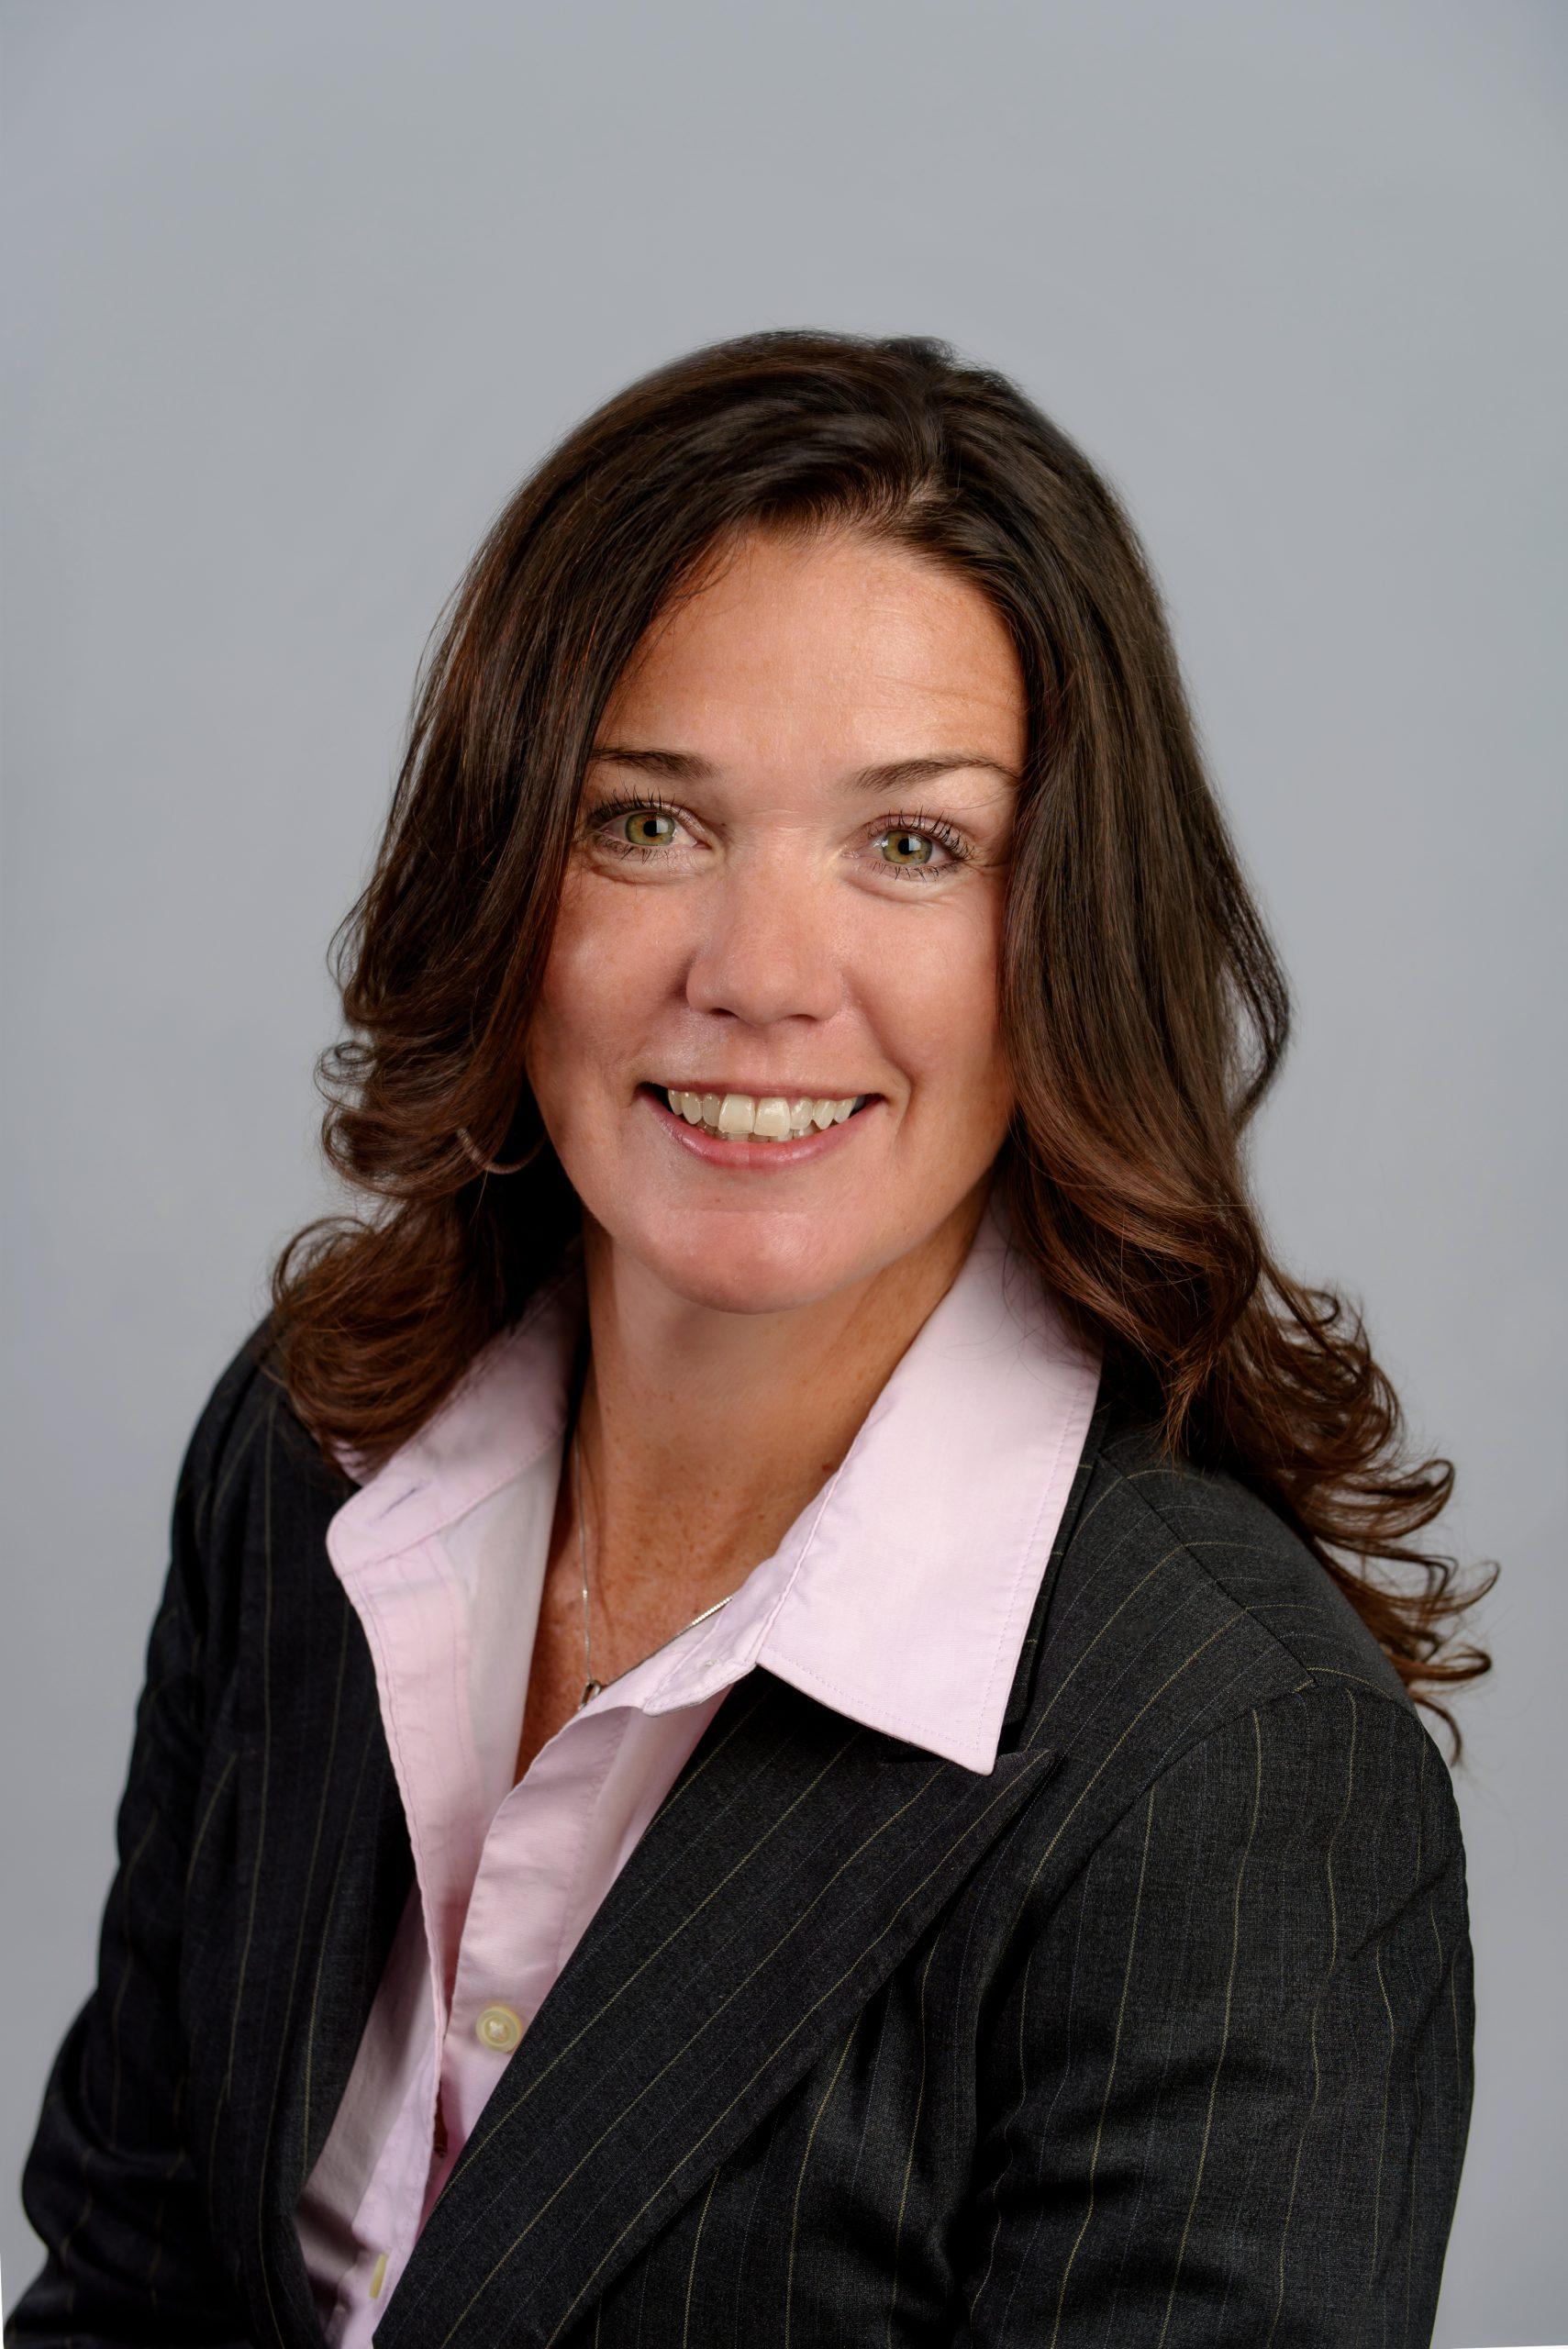 EXPERT: Christine Holmes